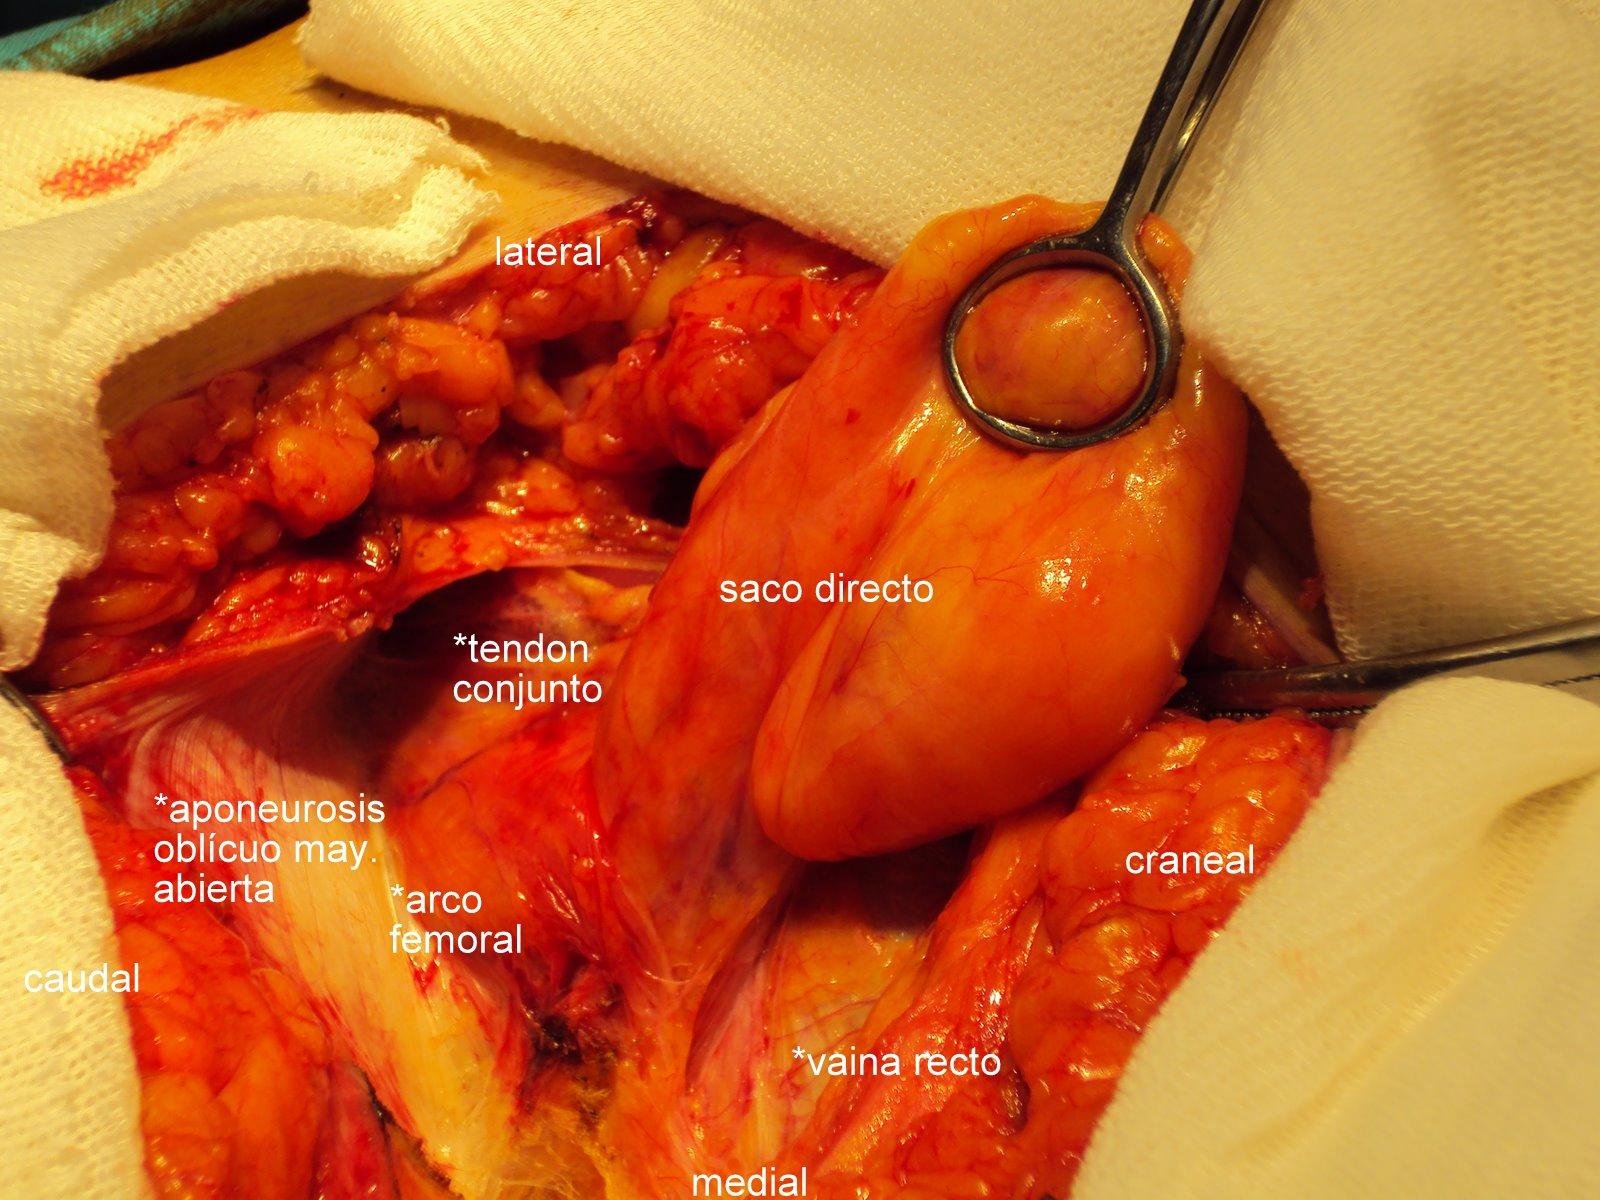 Que vi hoy: Anatomía inguinal